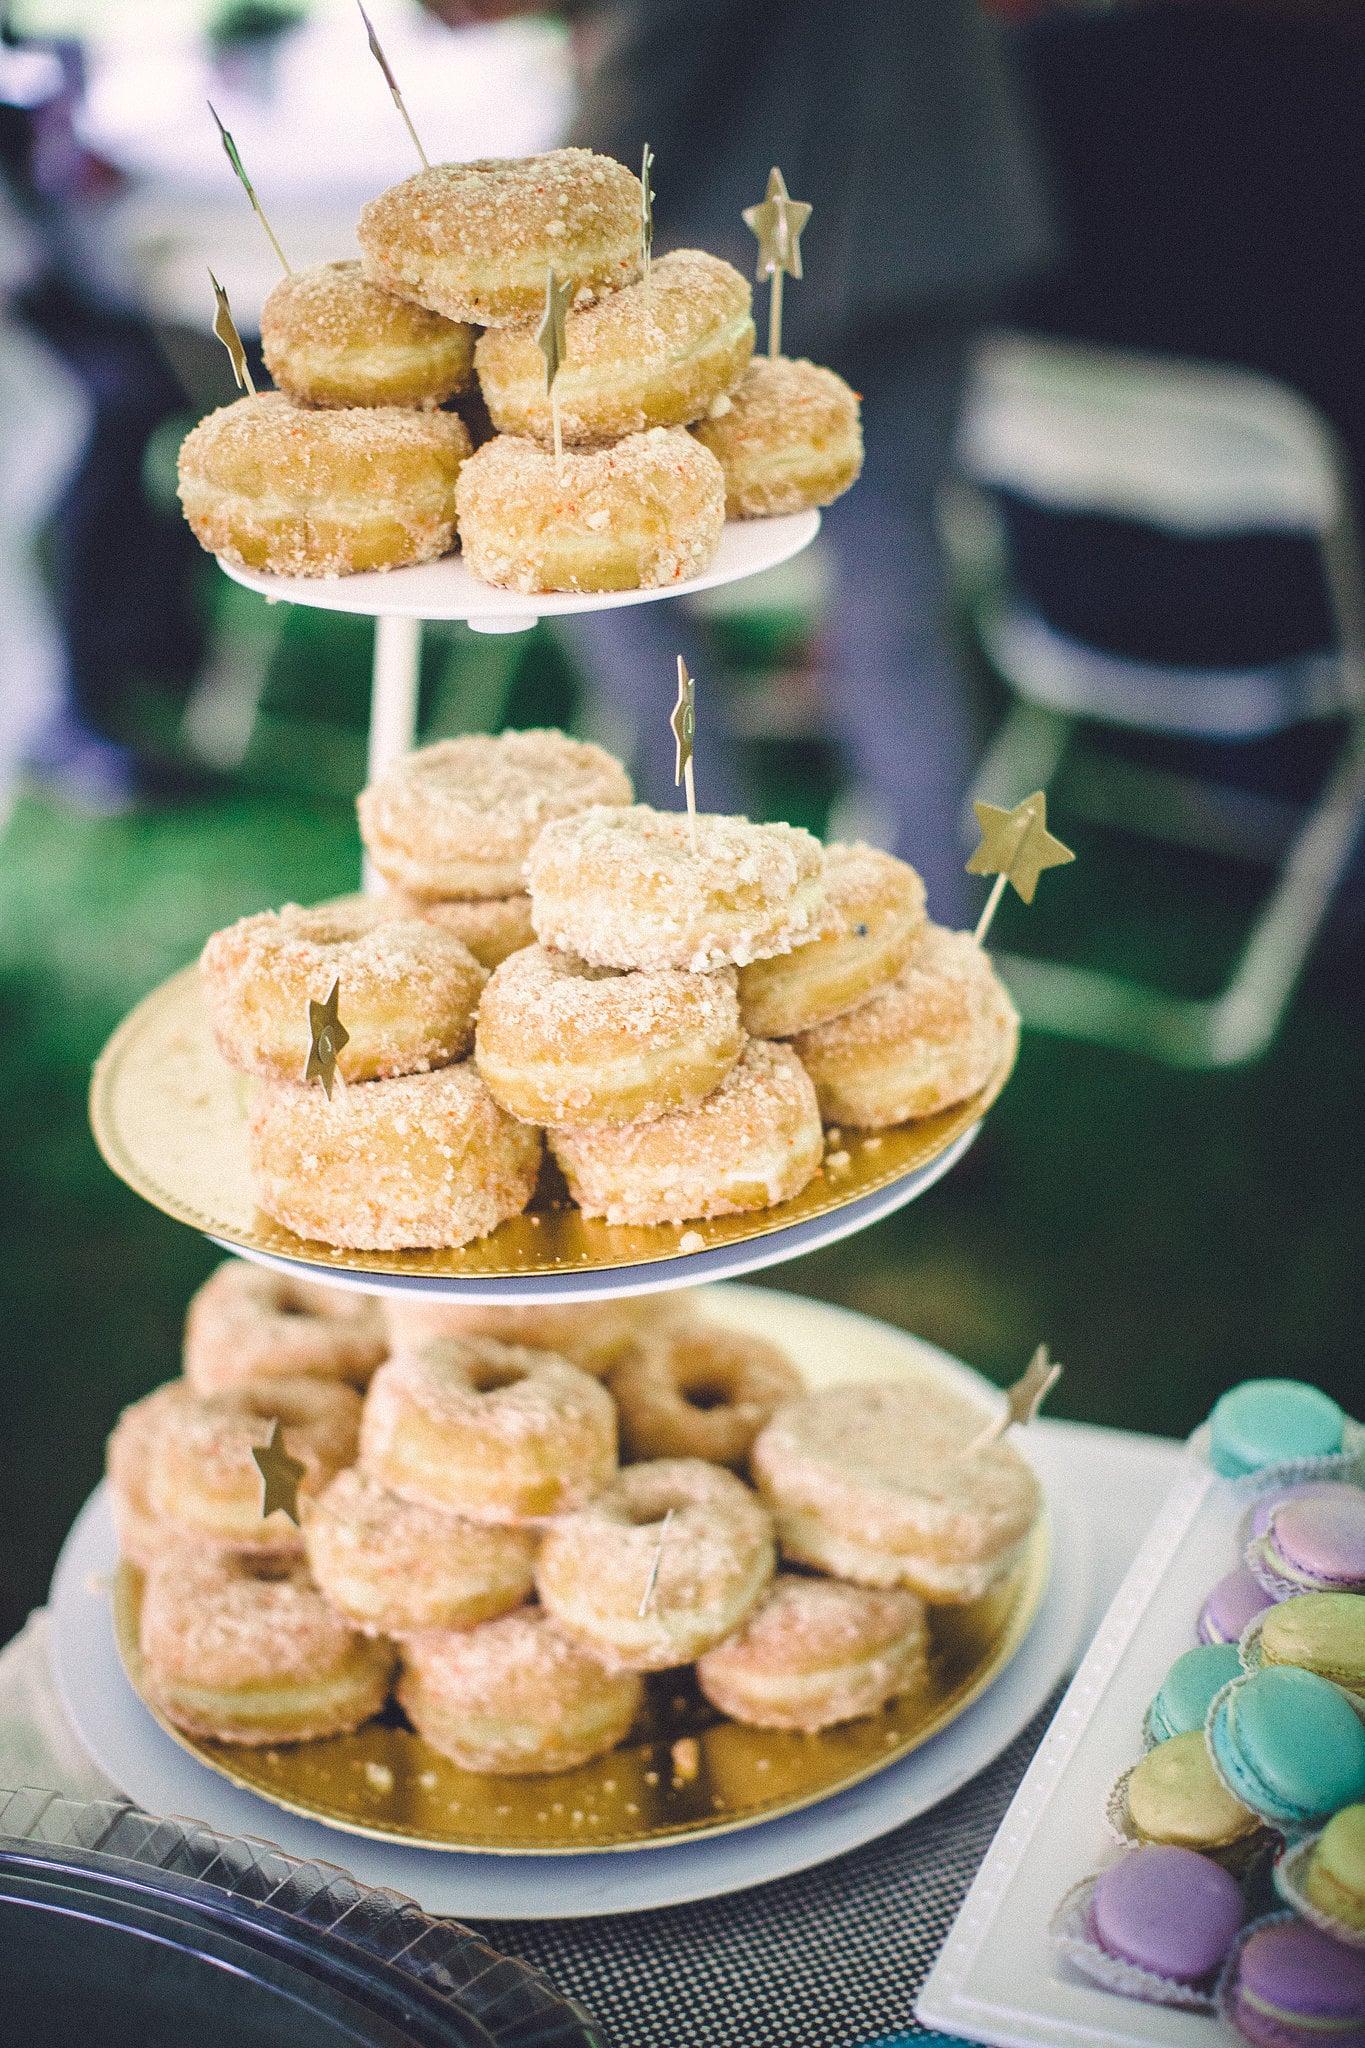 Doughnuts as a Wedding Cake Alternative | POPSUGAR Food